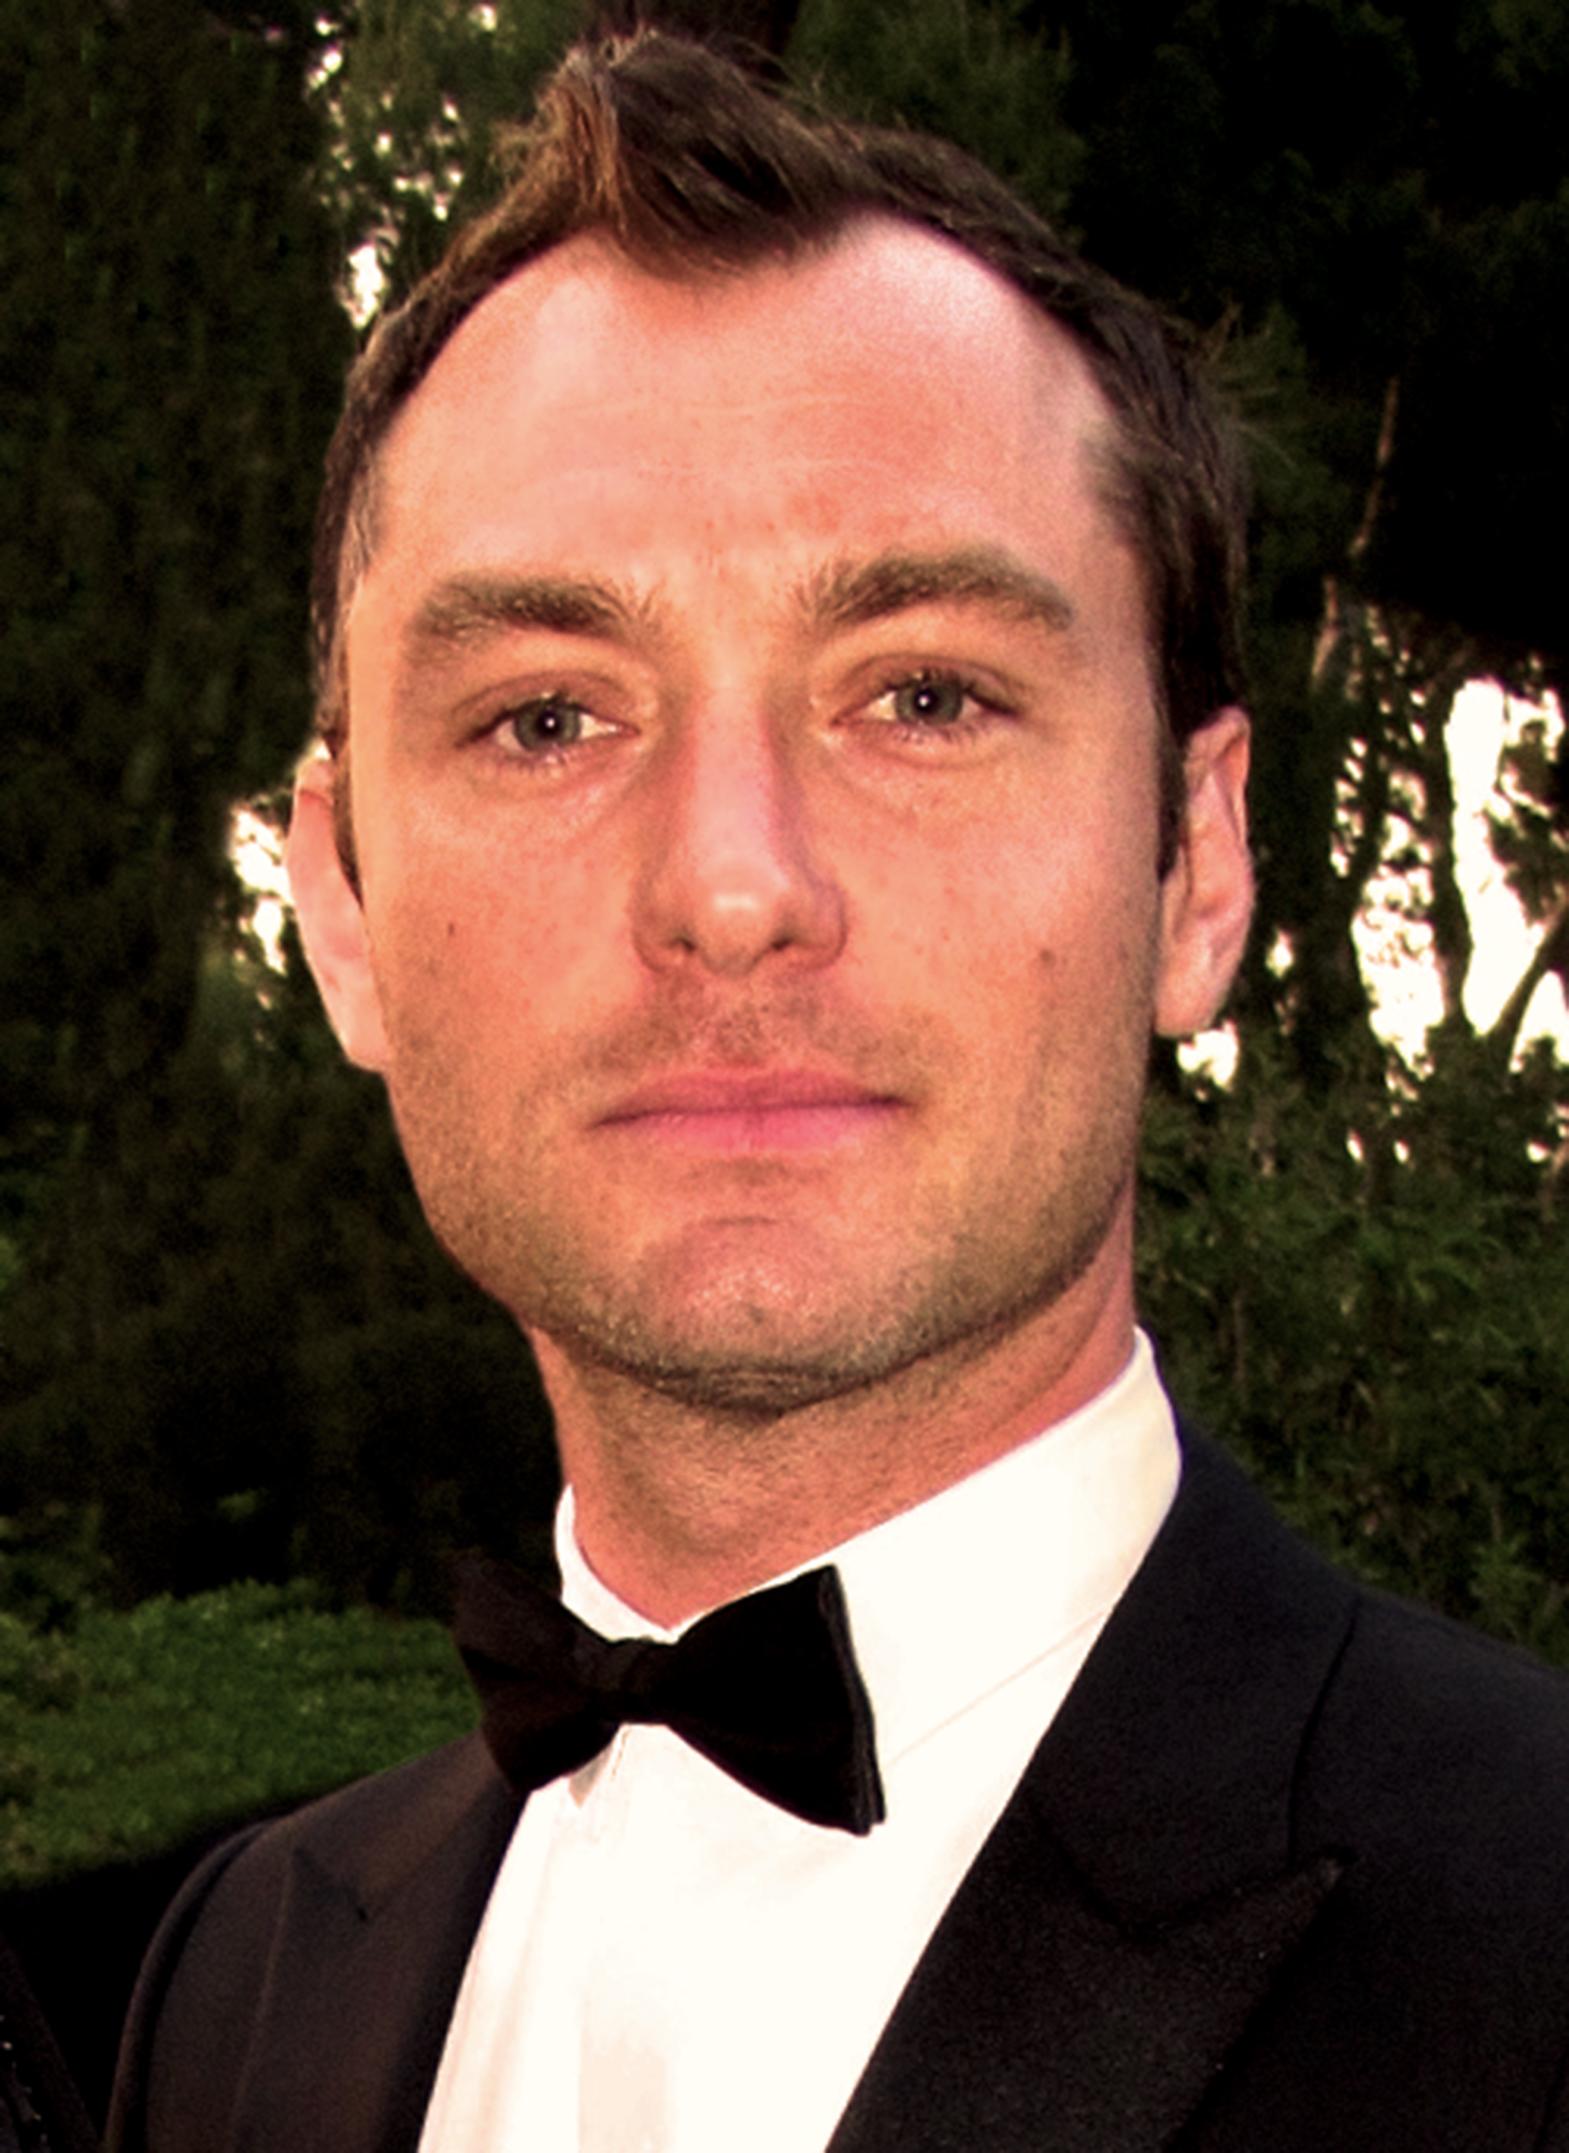 Jude Law by Nadja Amireh http://www.getnoticed.de